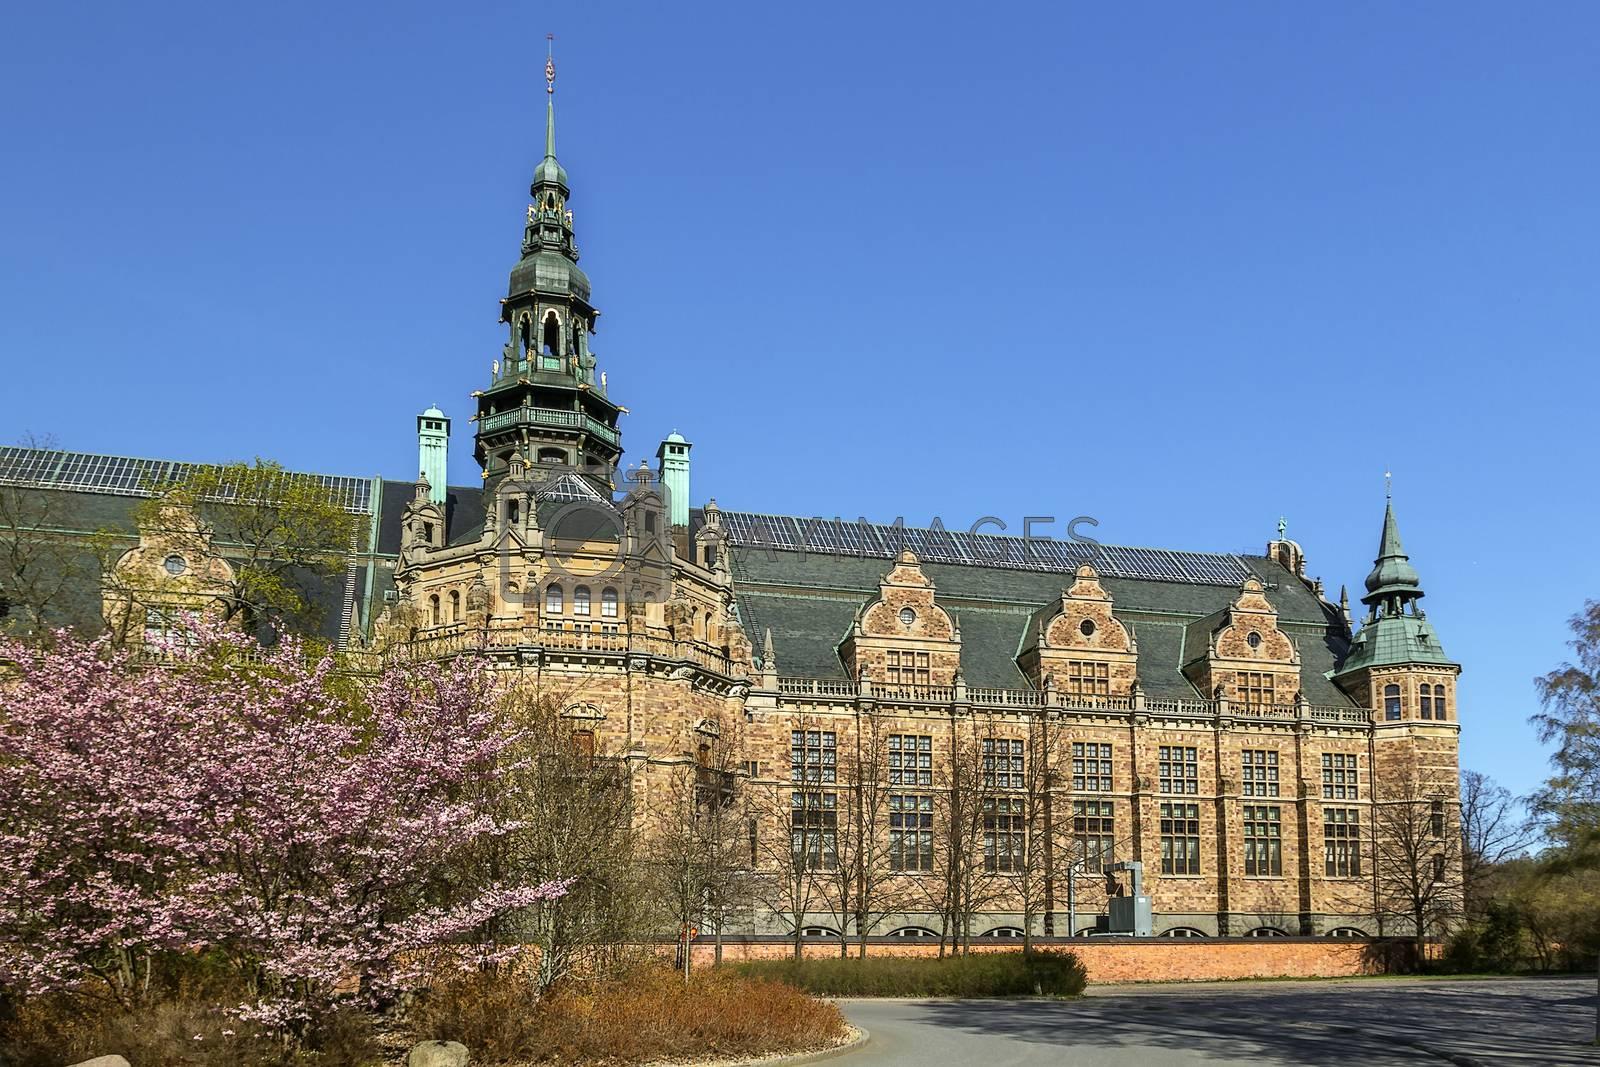 Nordic Museum, Stockholm by borisb17